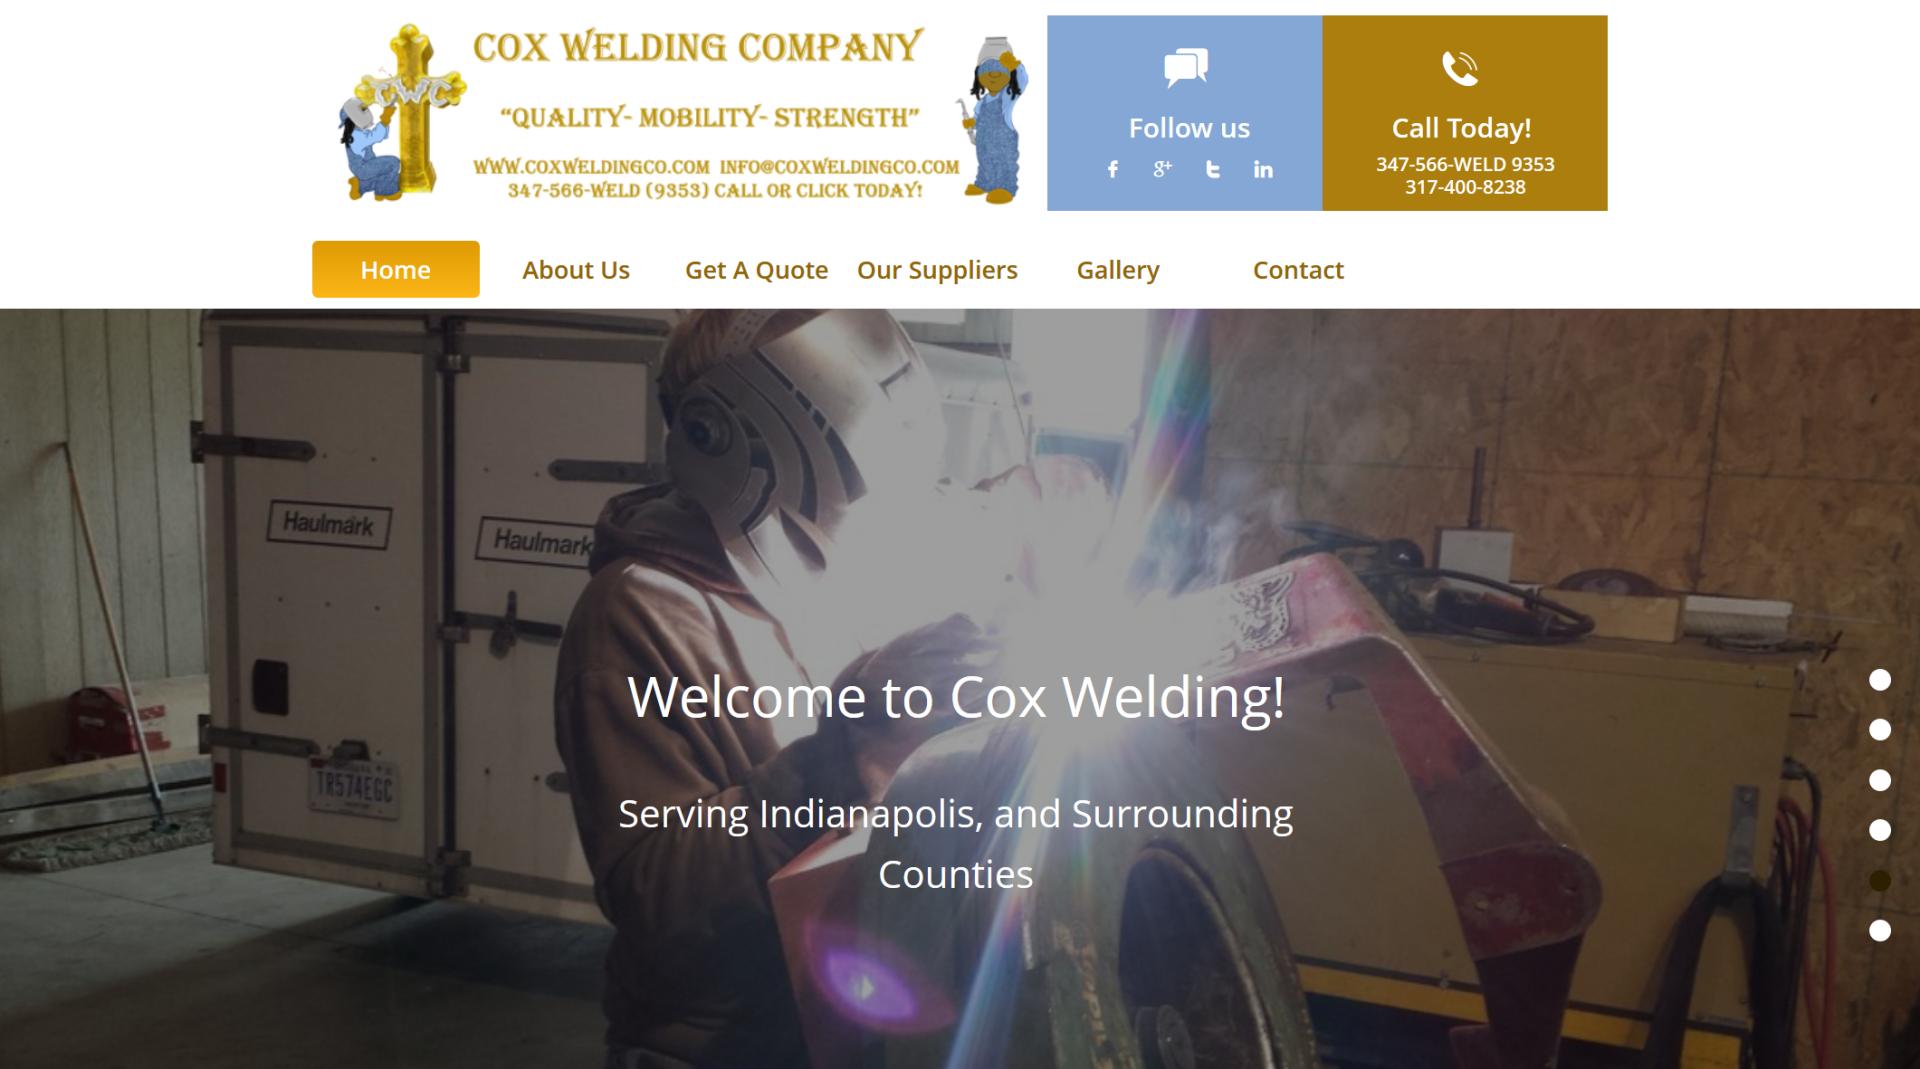 Cox Welding Company